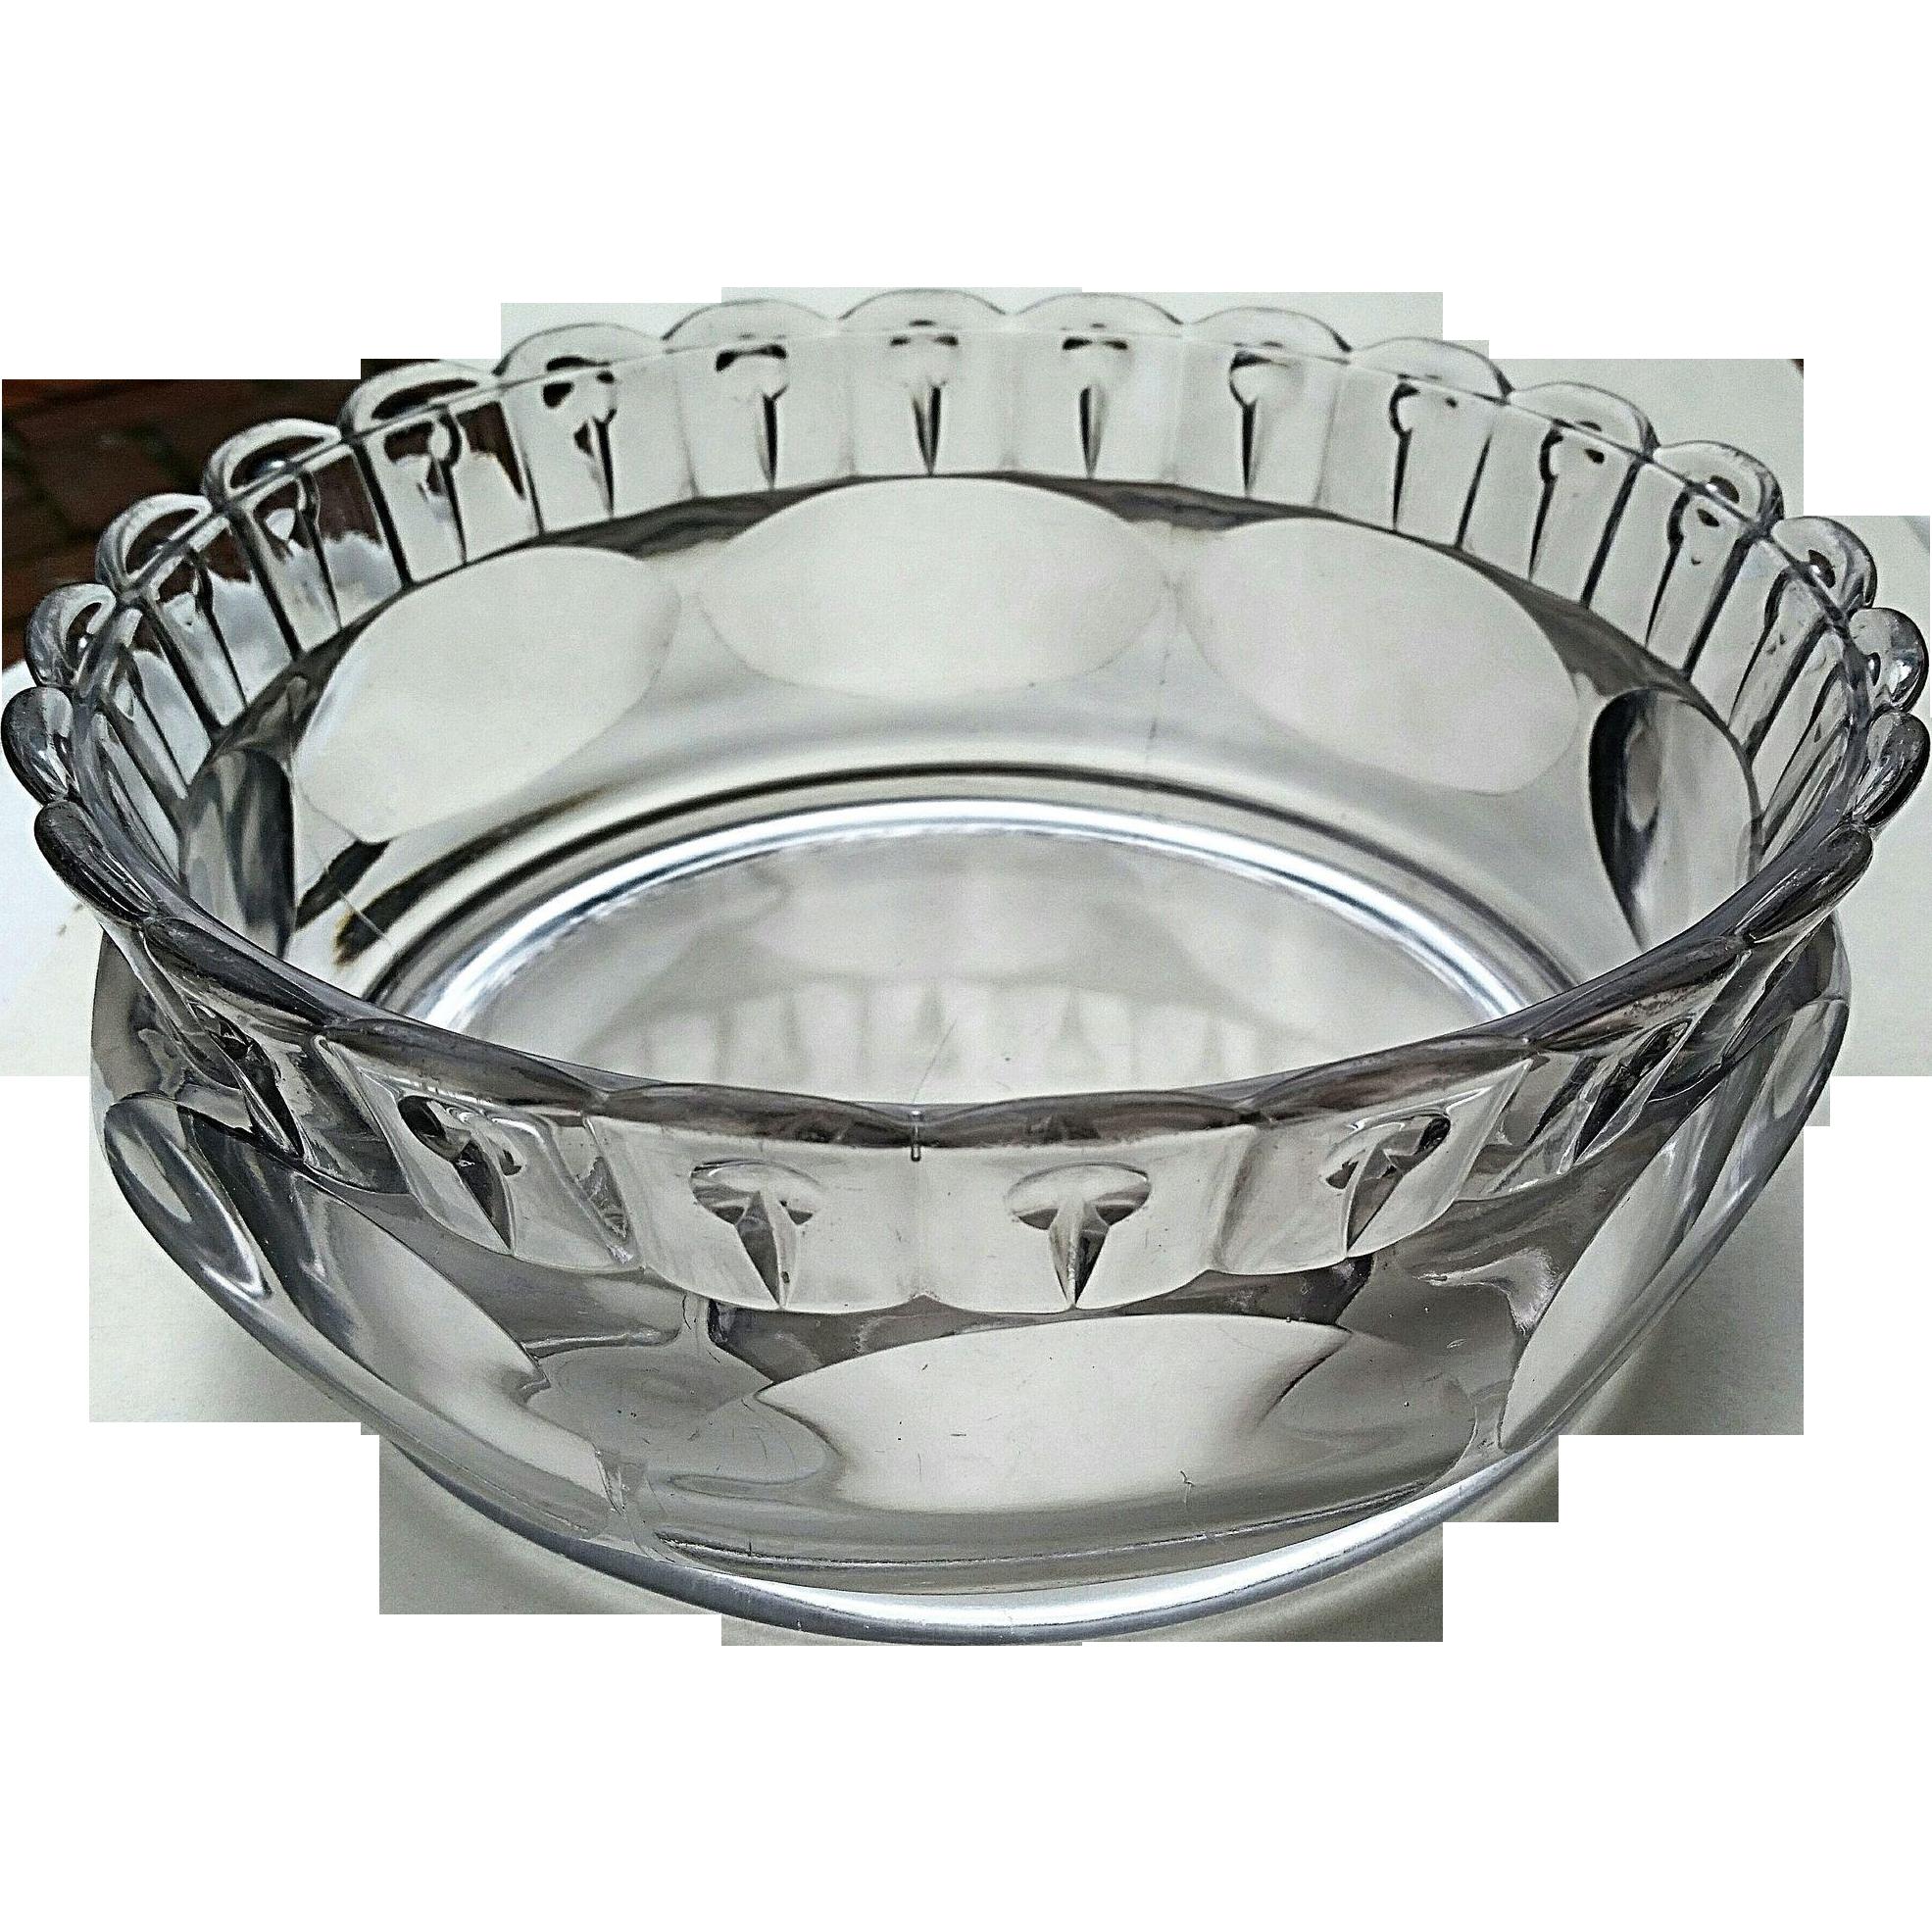 """Nail"" pattern 8 inch bowl, Ripley"